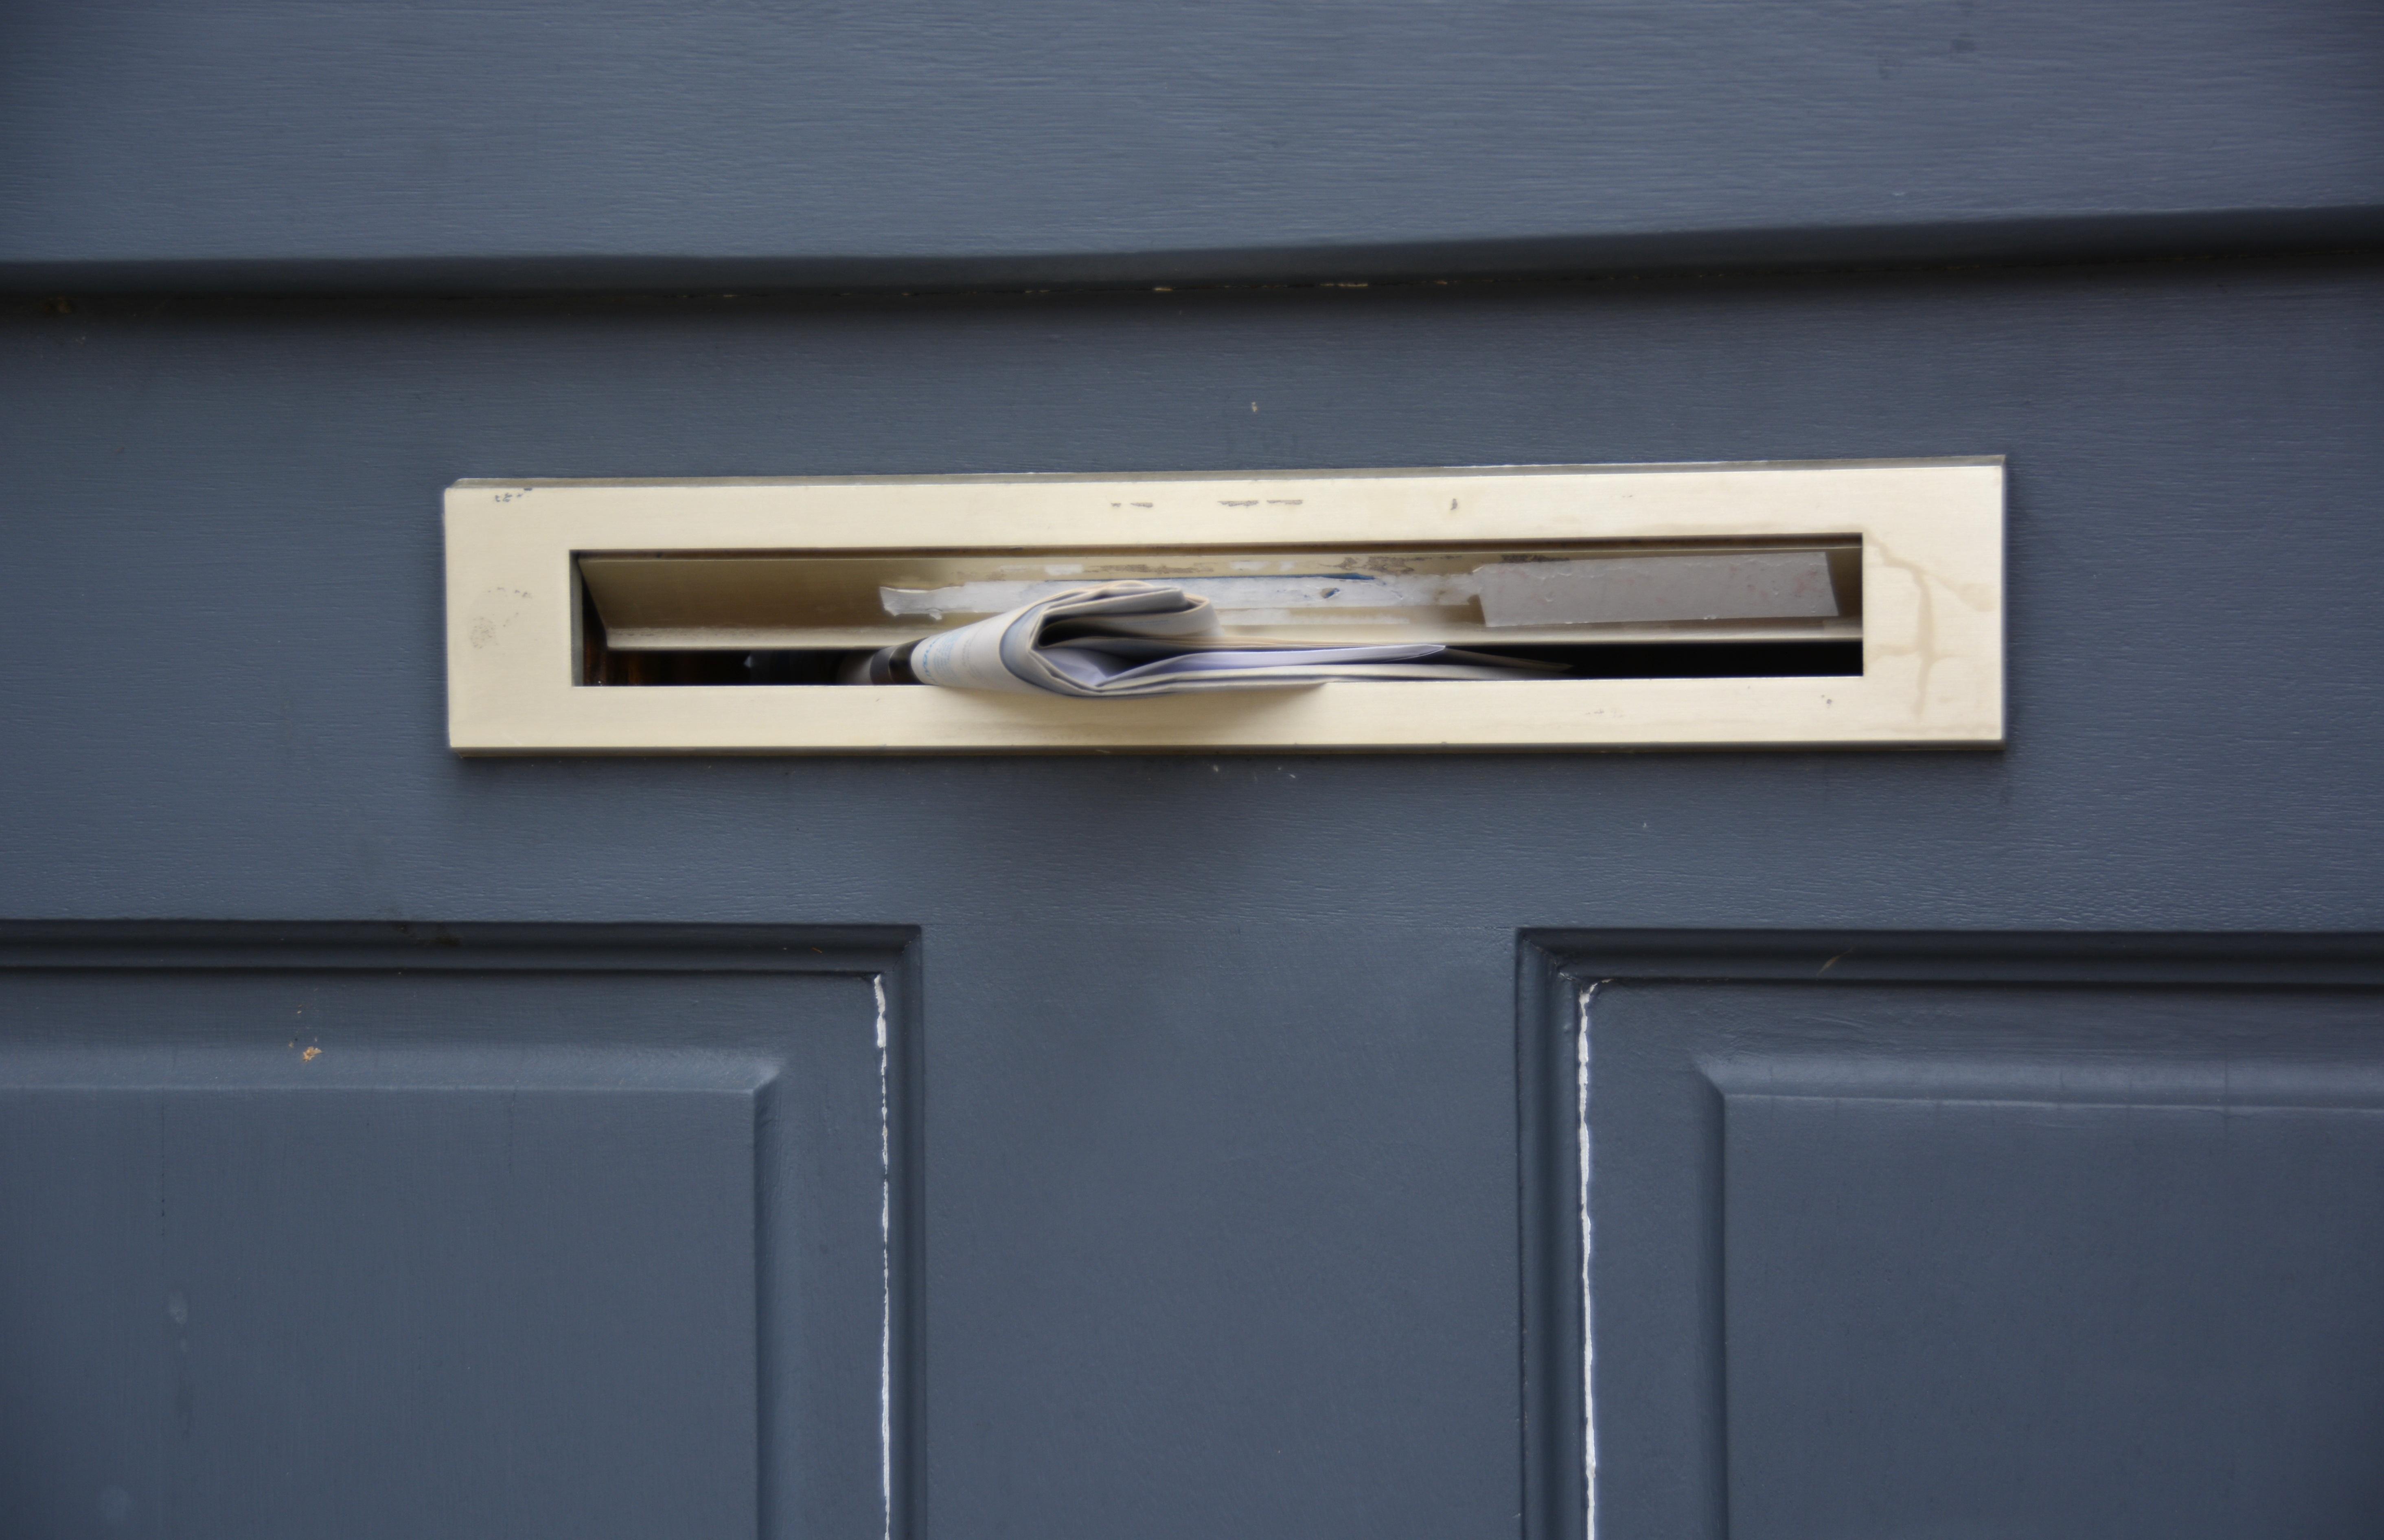 Fotos gratis enviar madera diario mueble habitaci n for Correo puerta a puerta